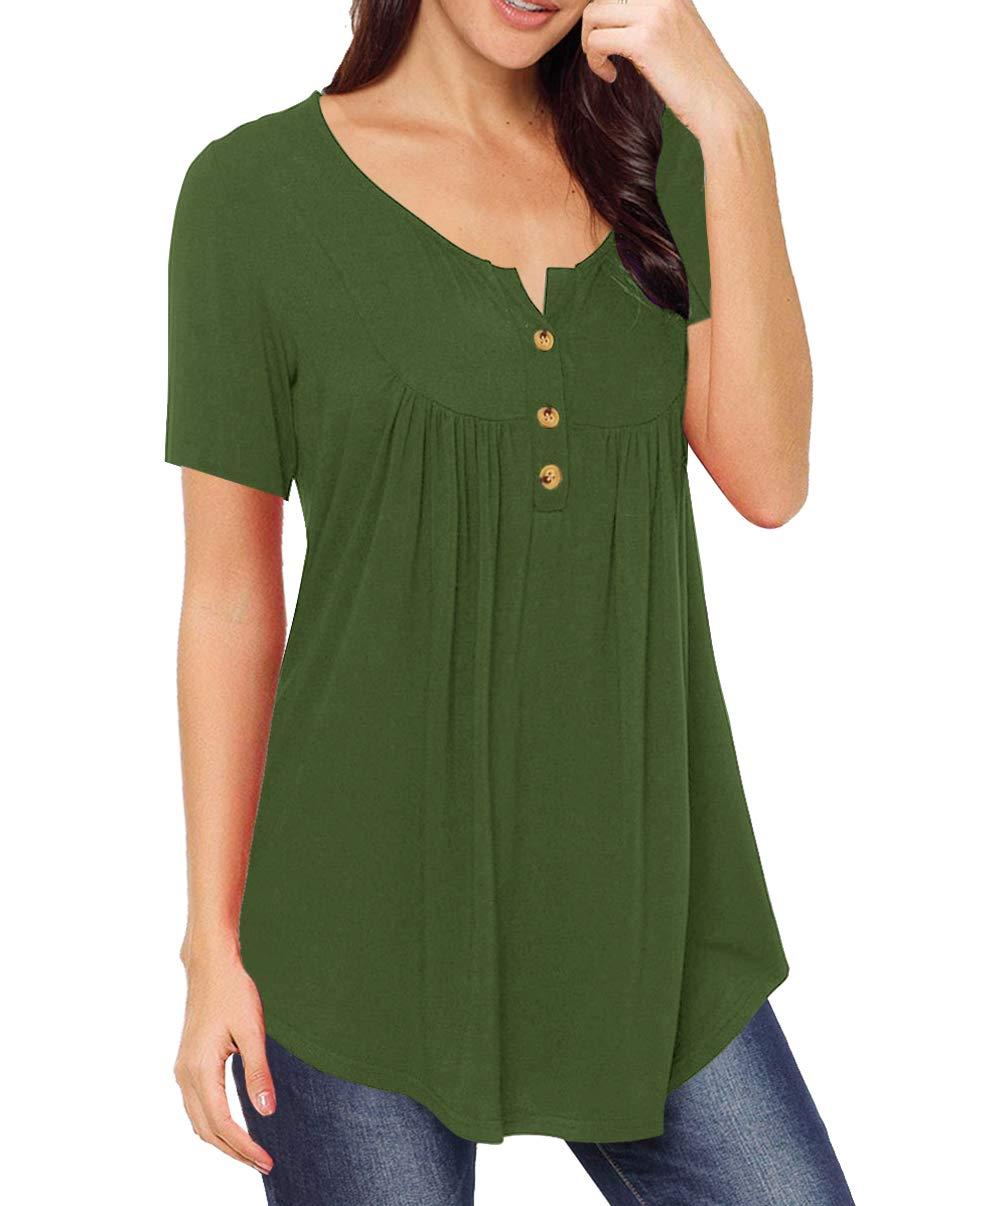 AMCLOS Womens V Neck T-Shirts Swing Ruffle Tops Button up Tunic Blouses Casual Henleys Short/Long Sleeve